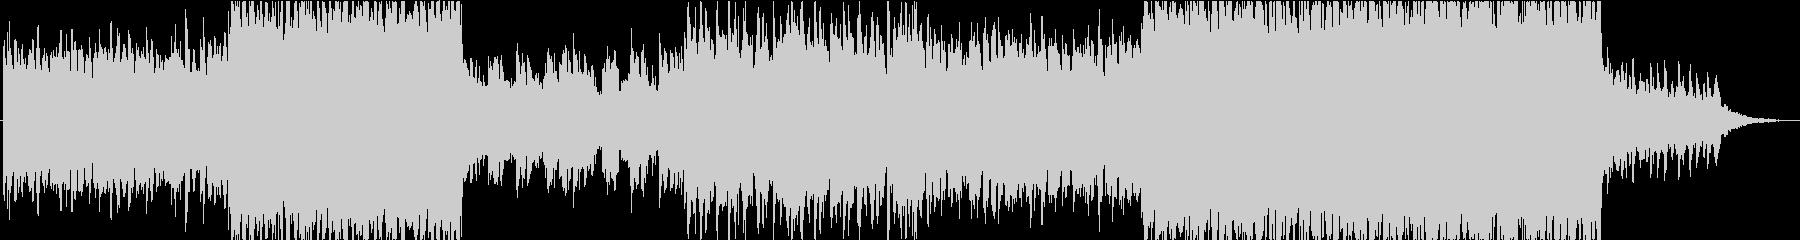 【BGM】透明感のあるJ-R&Bトラックの未再生の波形